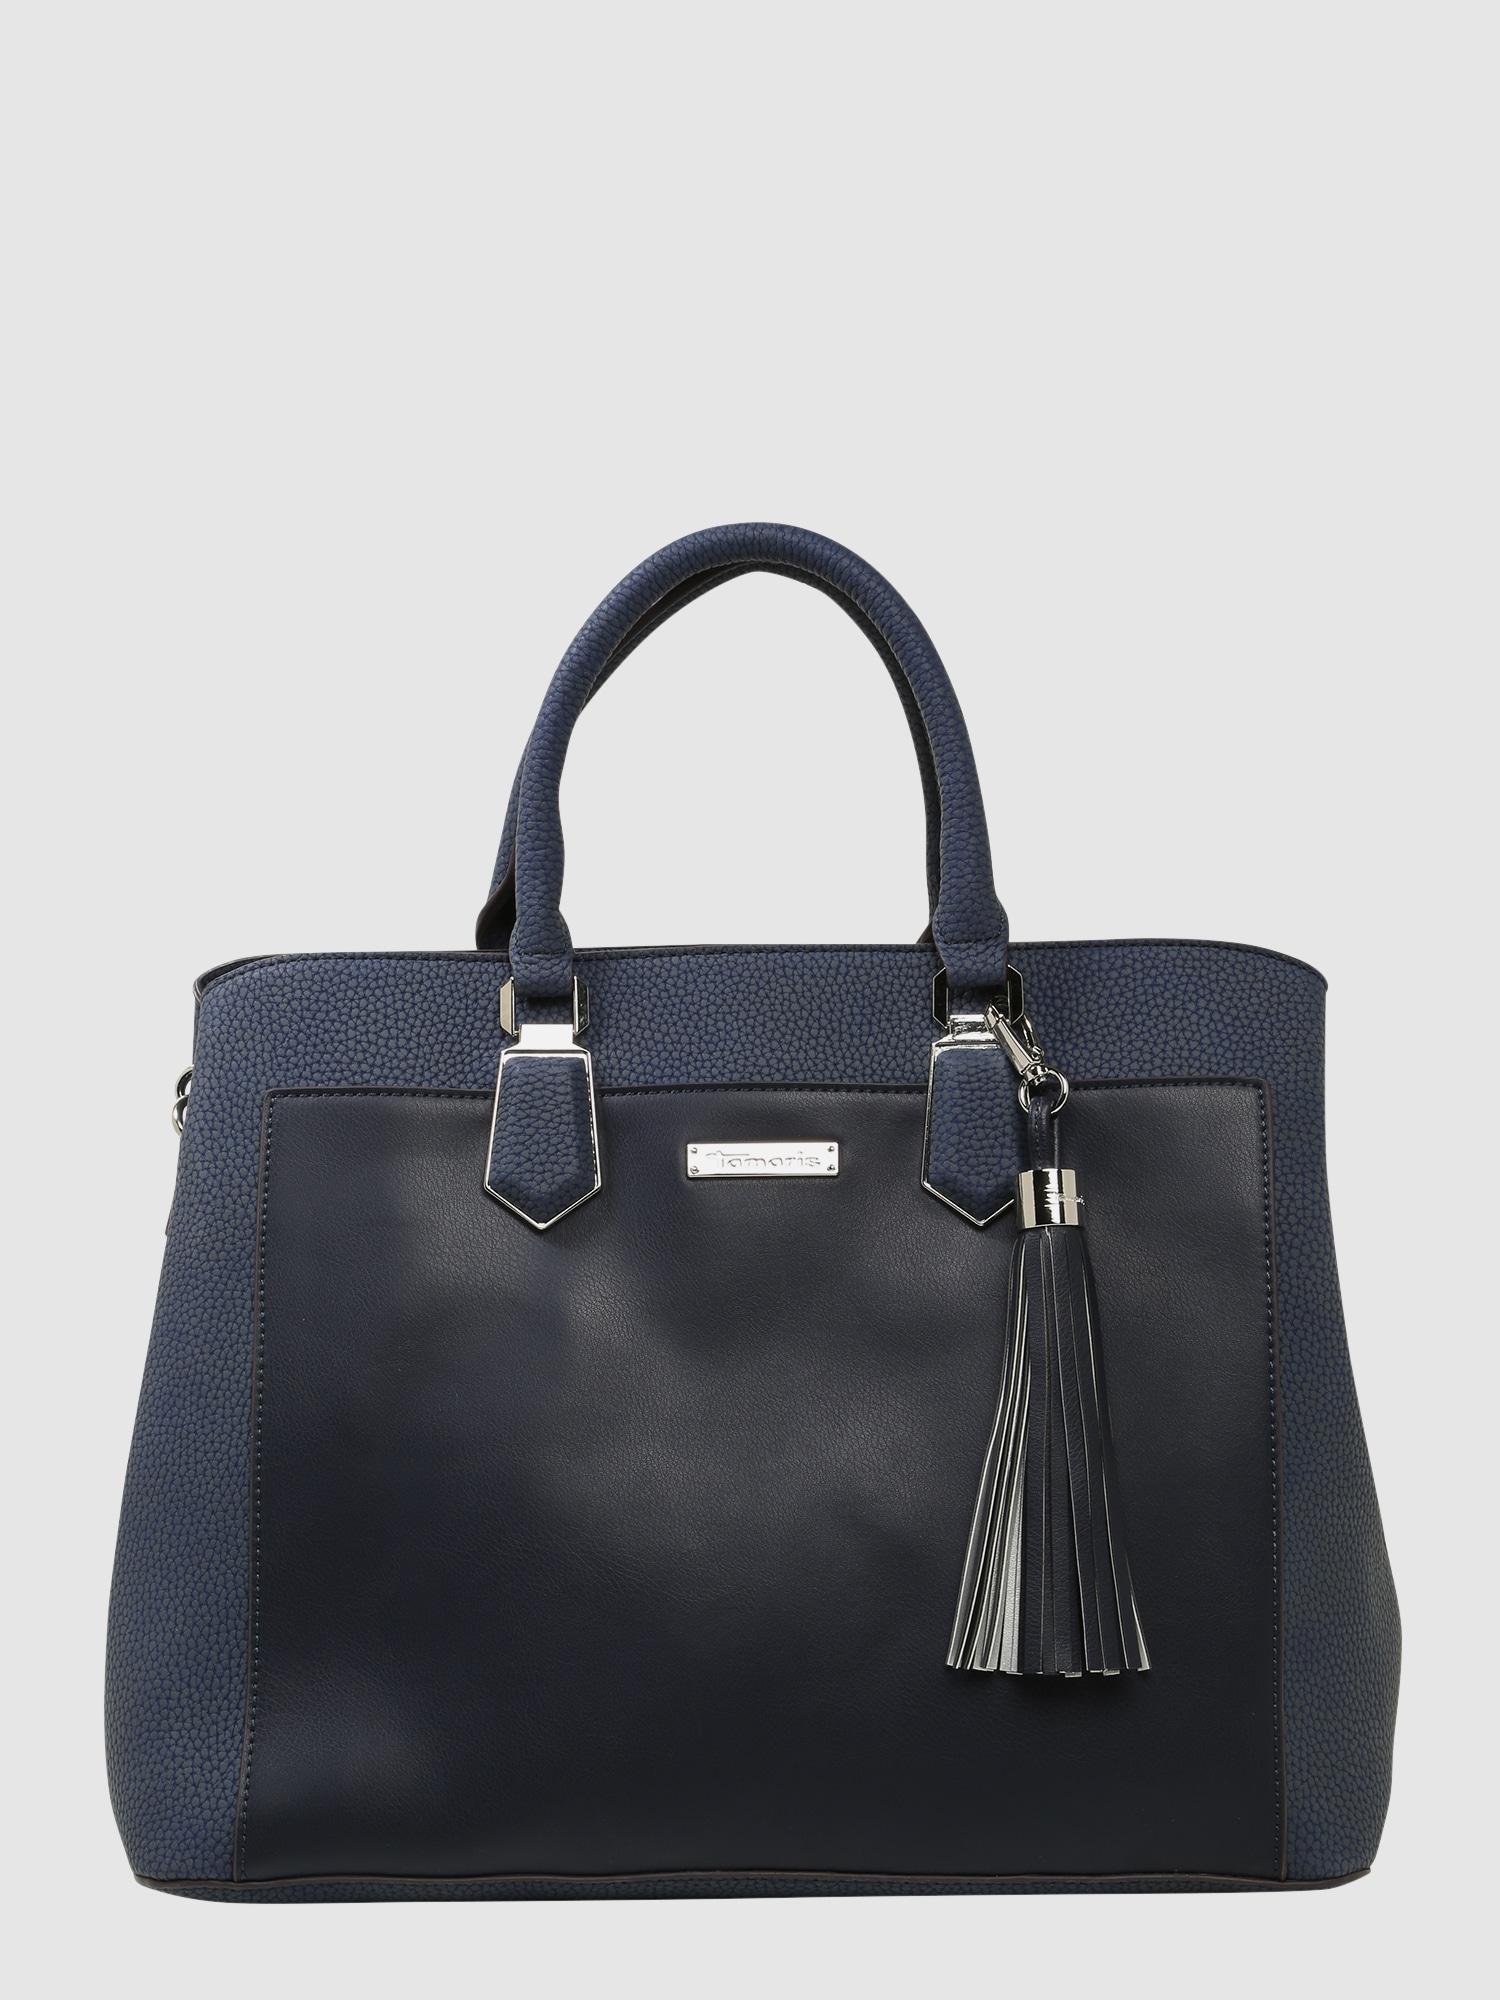 tamaris handtasche 39 elsa 39 in blau about you. Black Bedroom Furniture Sets. Home Design Ideas